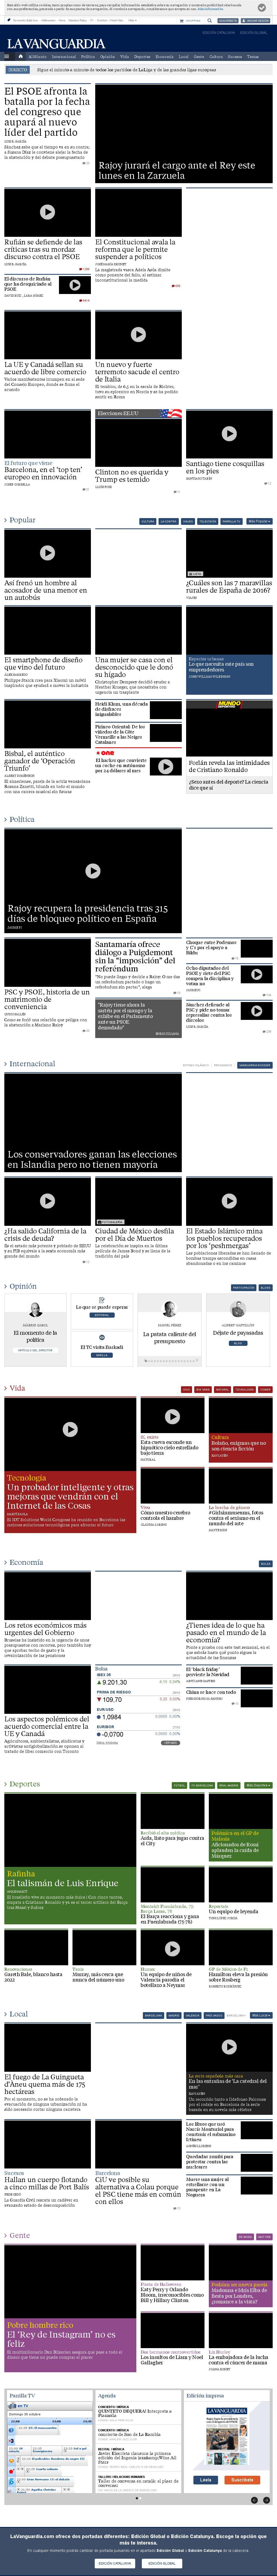 La Vanguardia at Sunday Oct. 30, 2016, 4:26 p.m. UTC